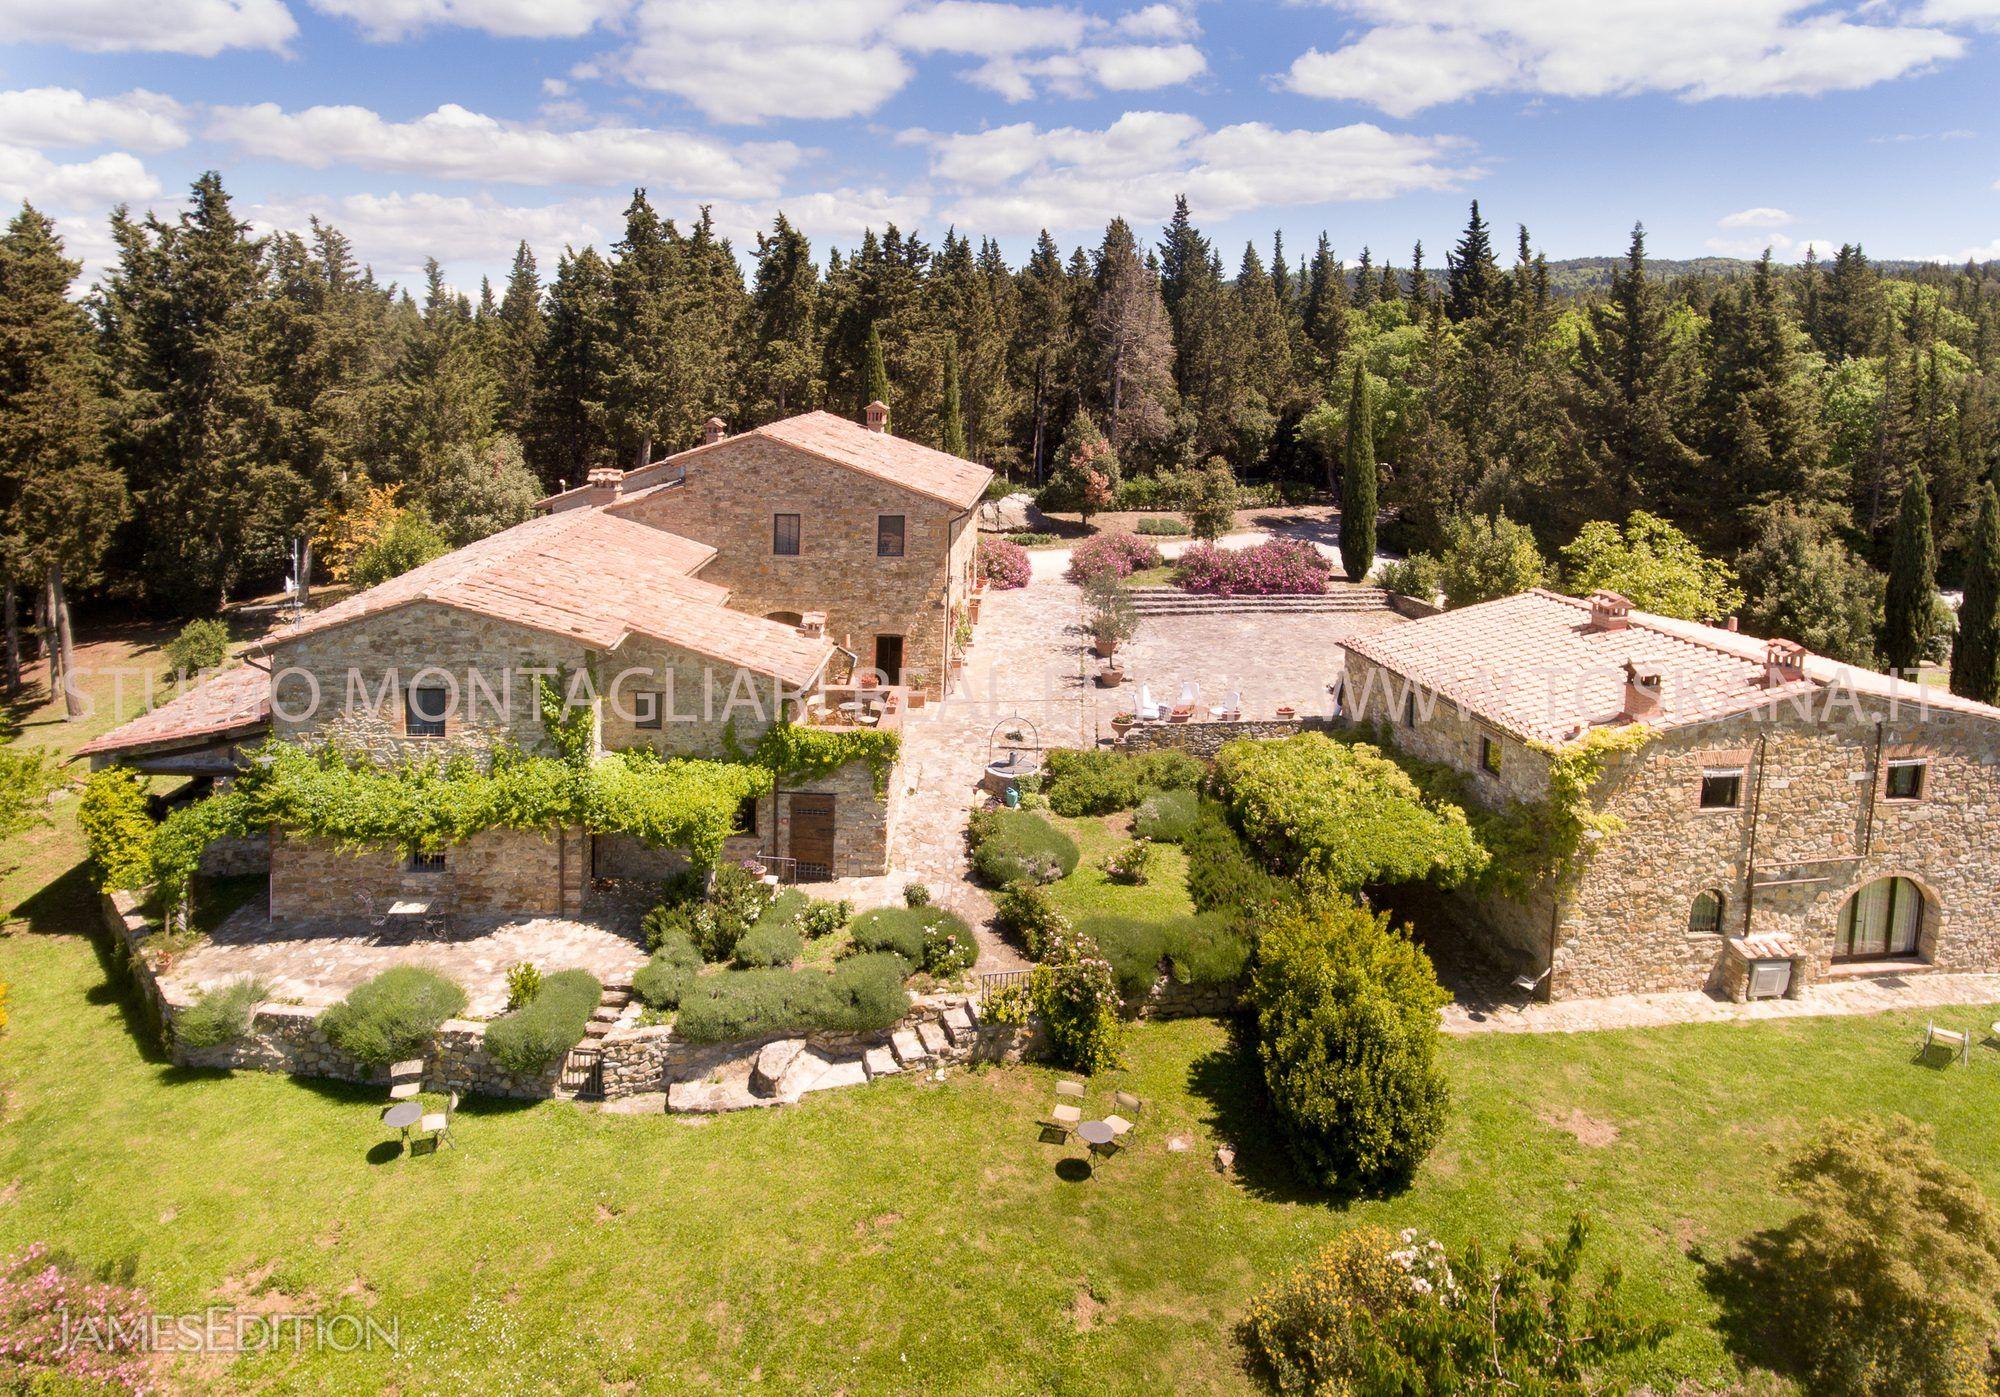 Villa in Barberino Val d'Elsa, Tuscany, Italy 1